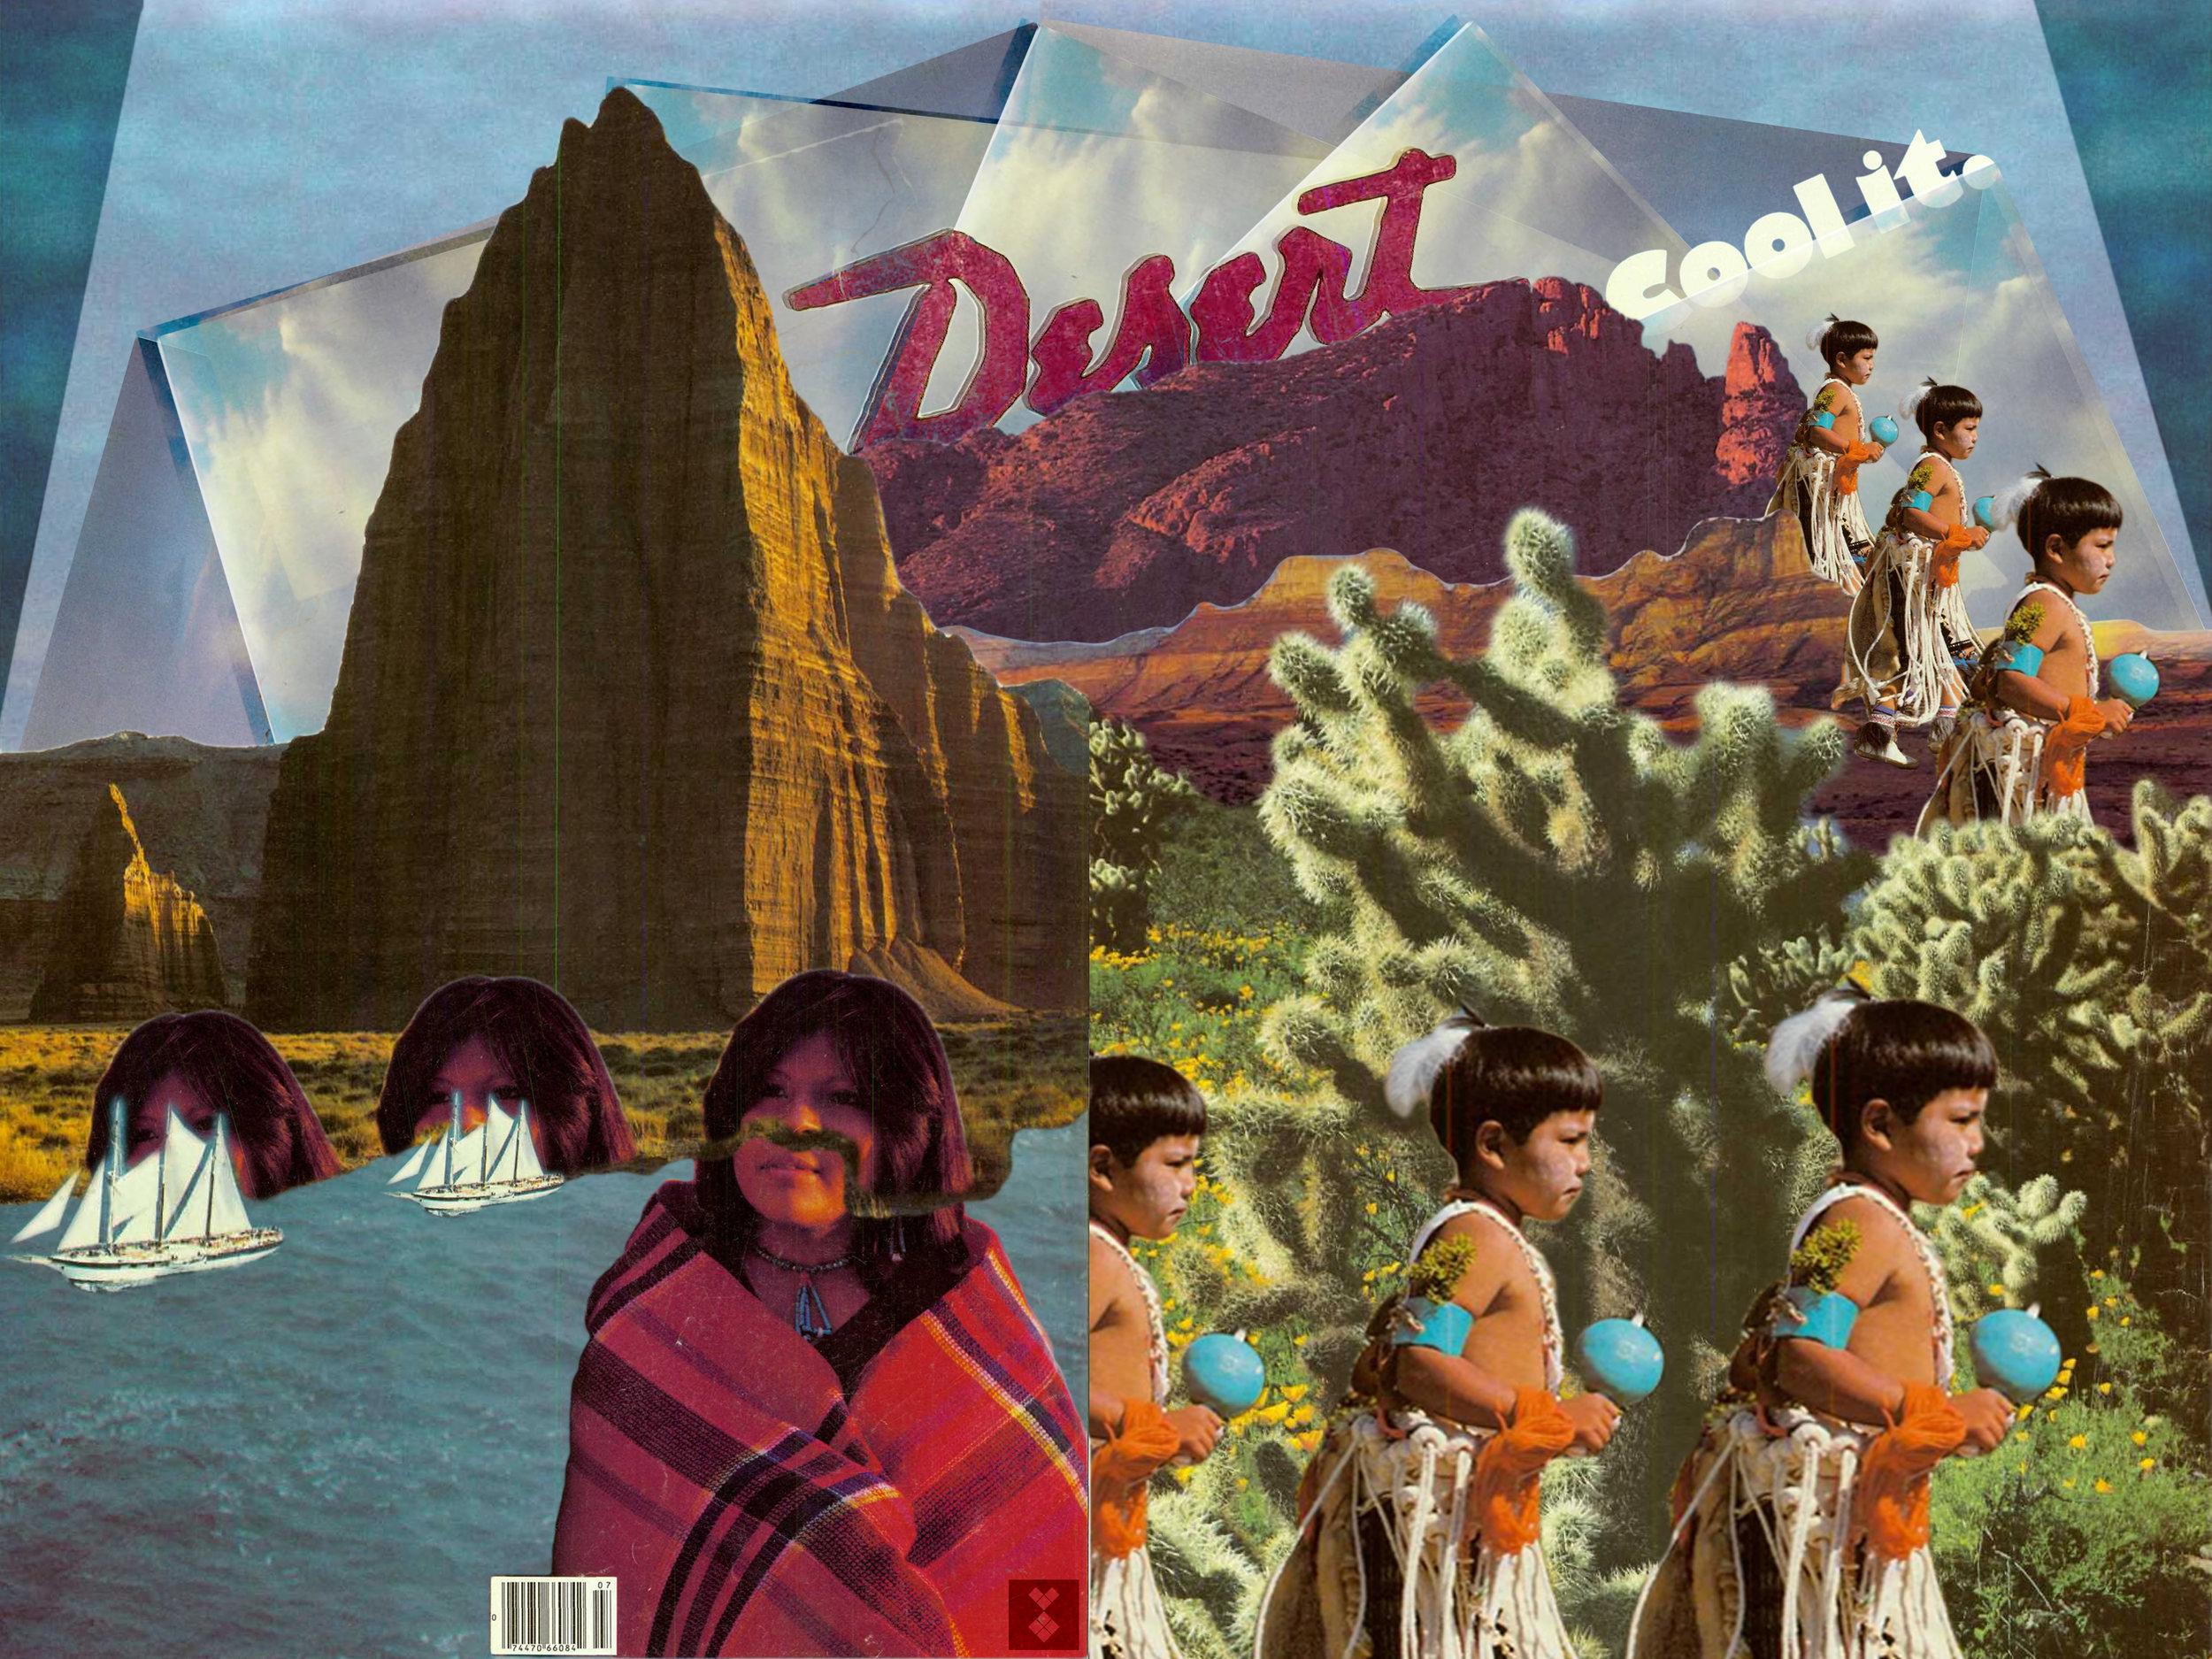 DESERT+Cool+It+Collage.jpg